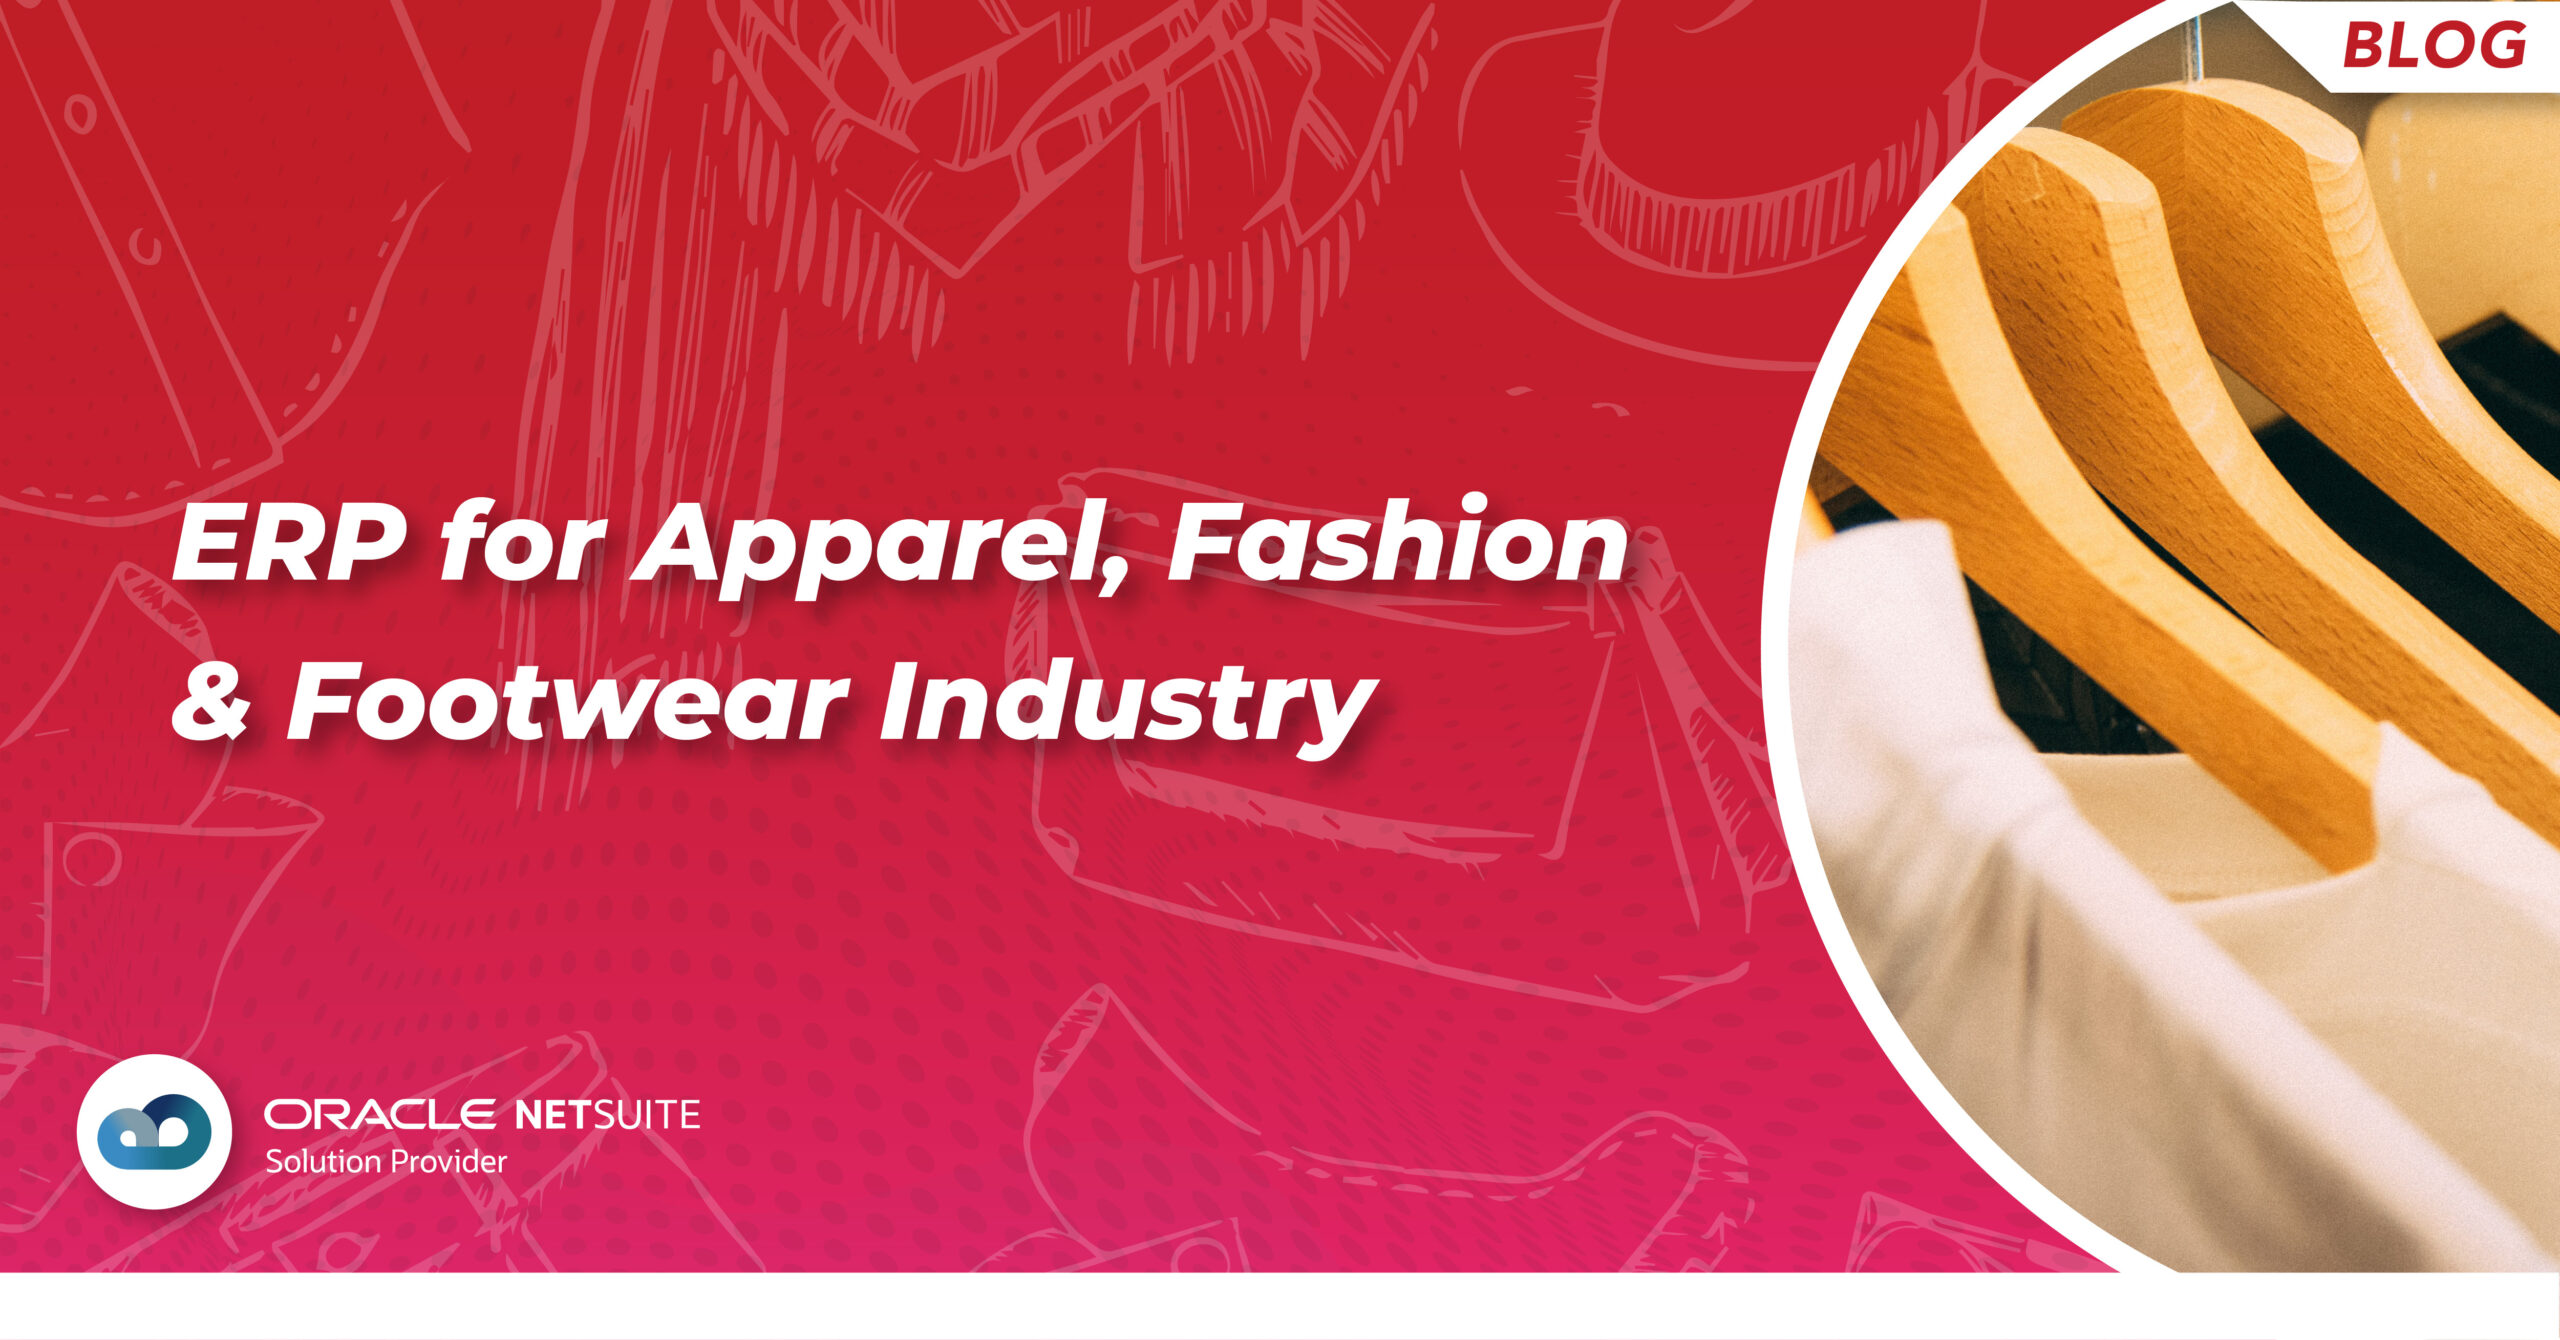 ERP for Apparel, Fashion & footwear industry